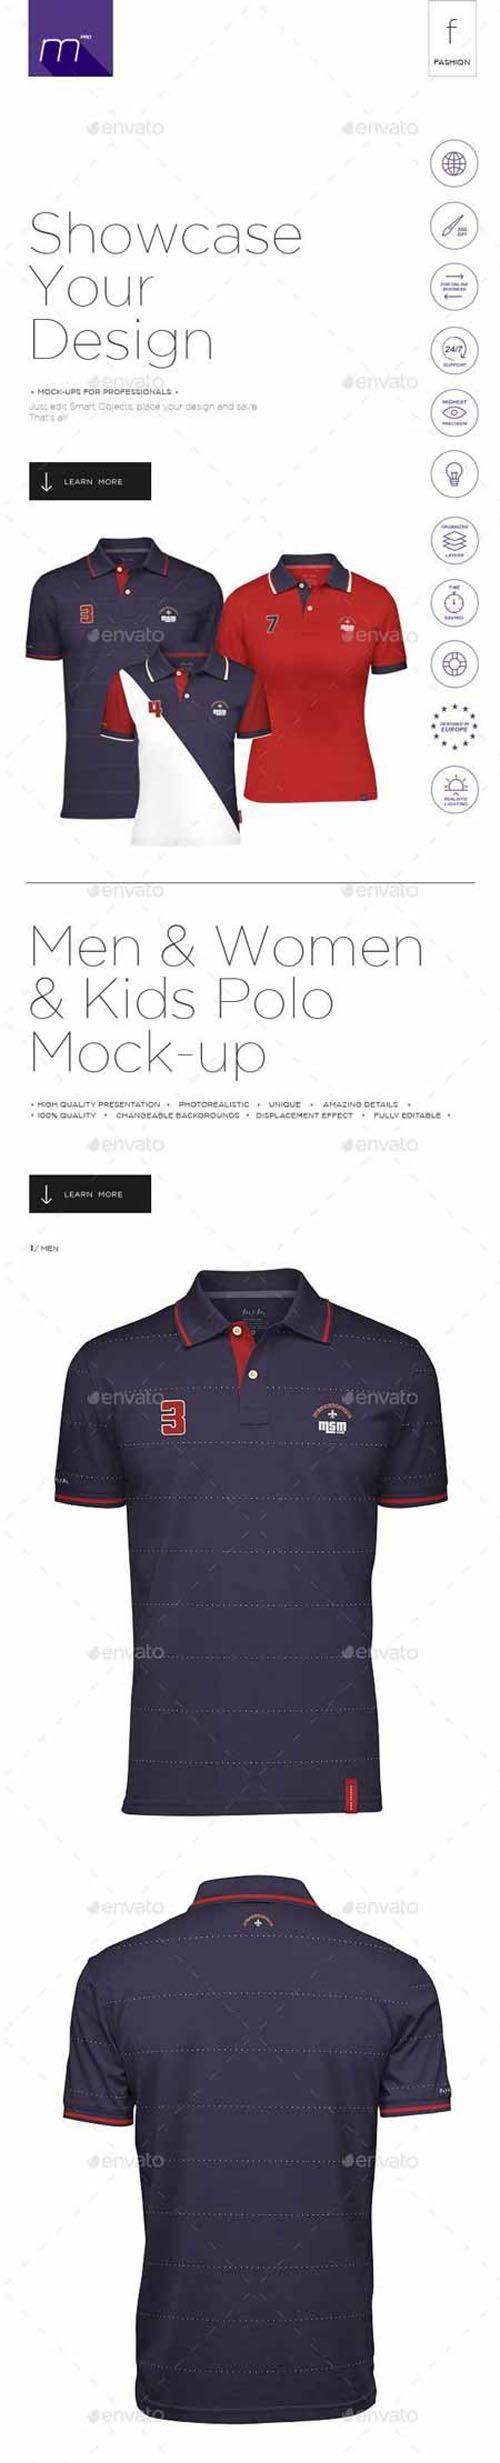 Shirt design app for mac - Gr Polo Shirt For Men Women Kids